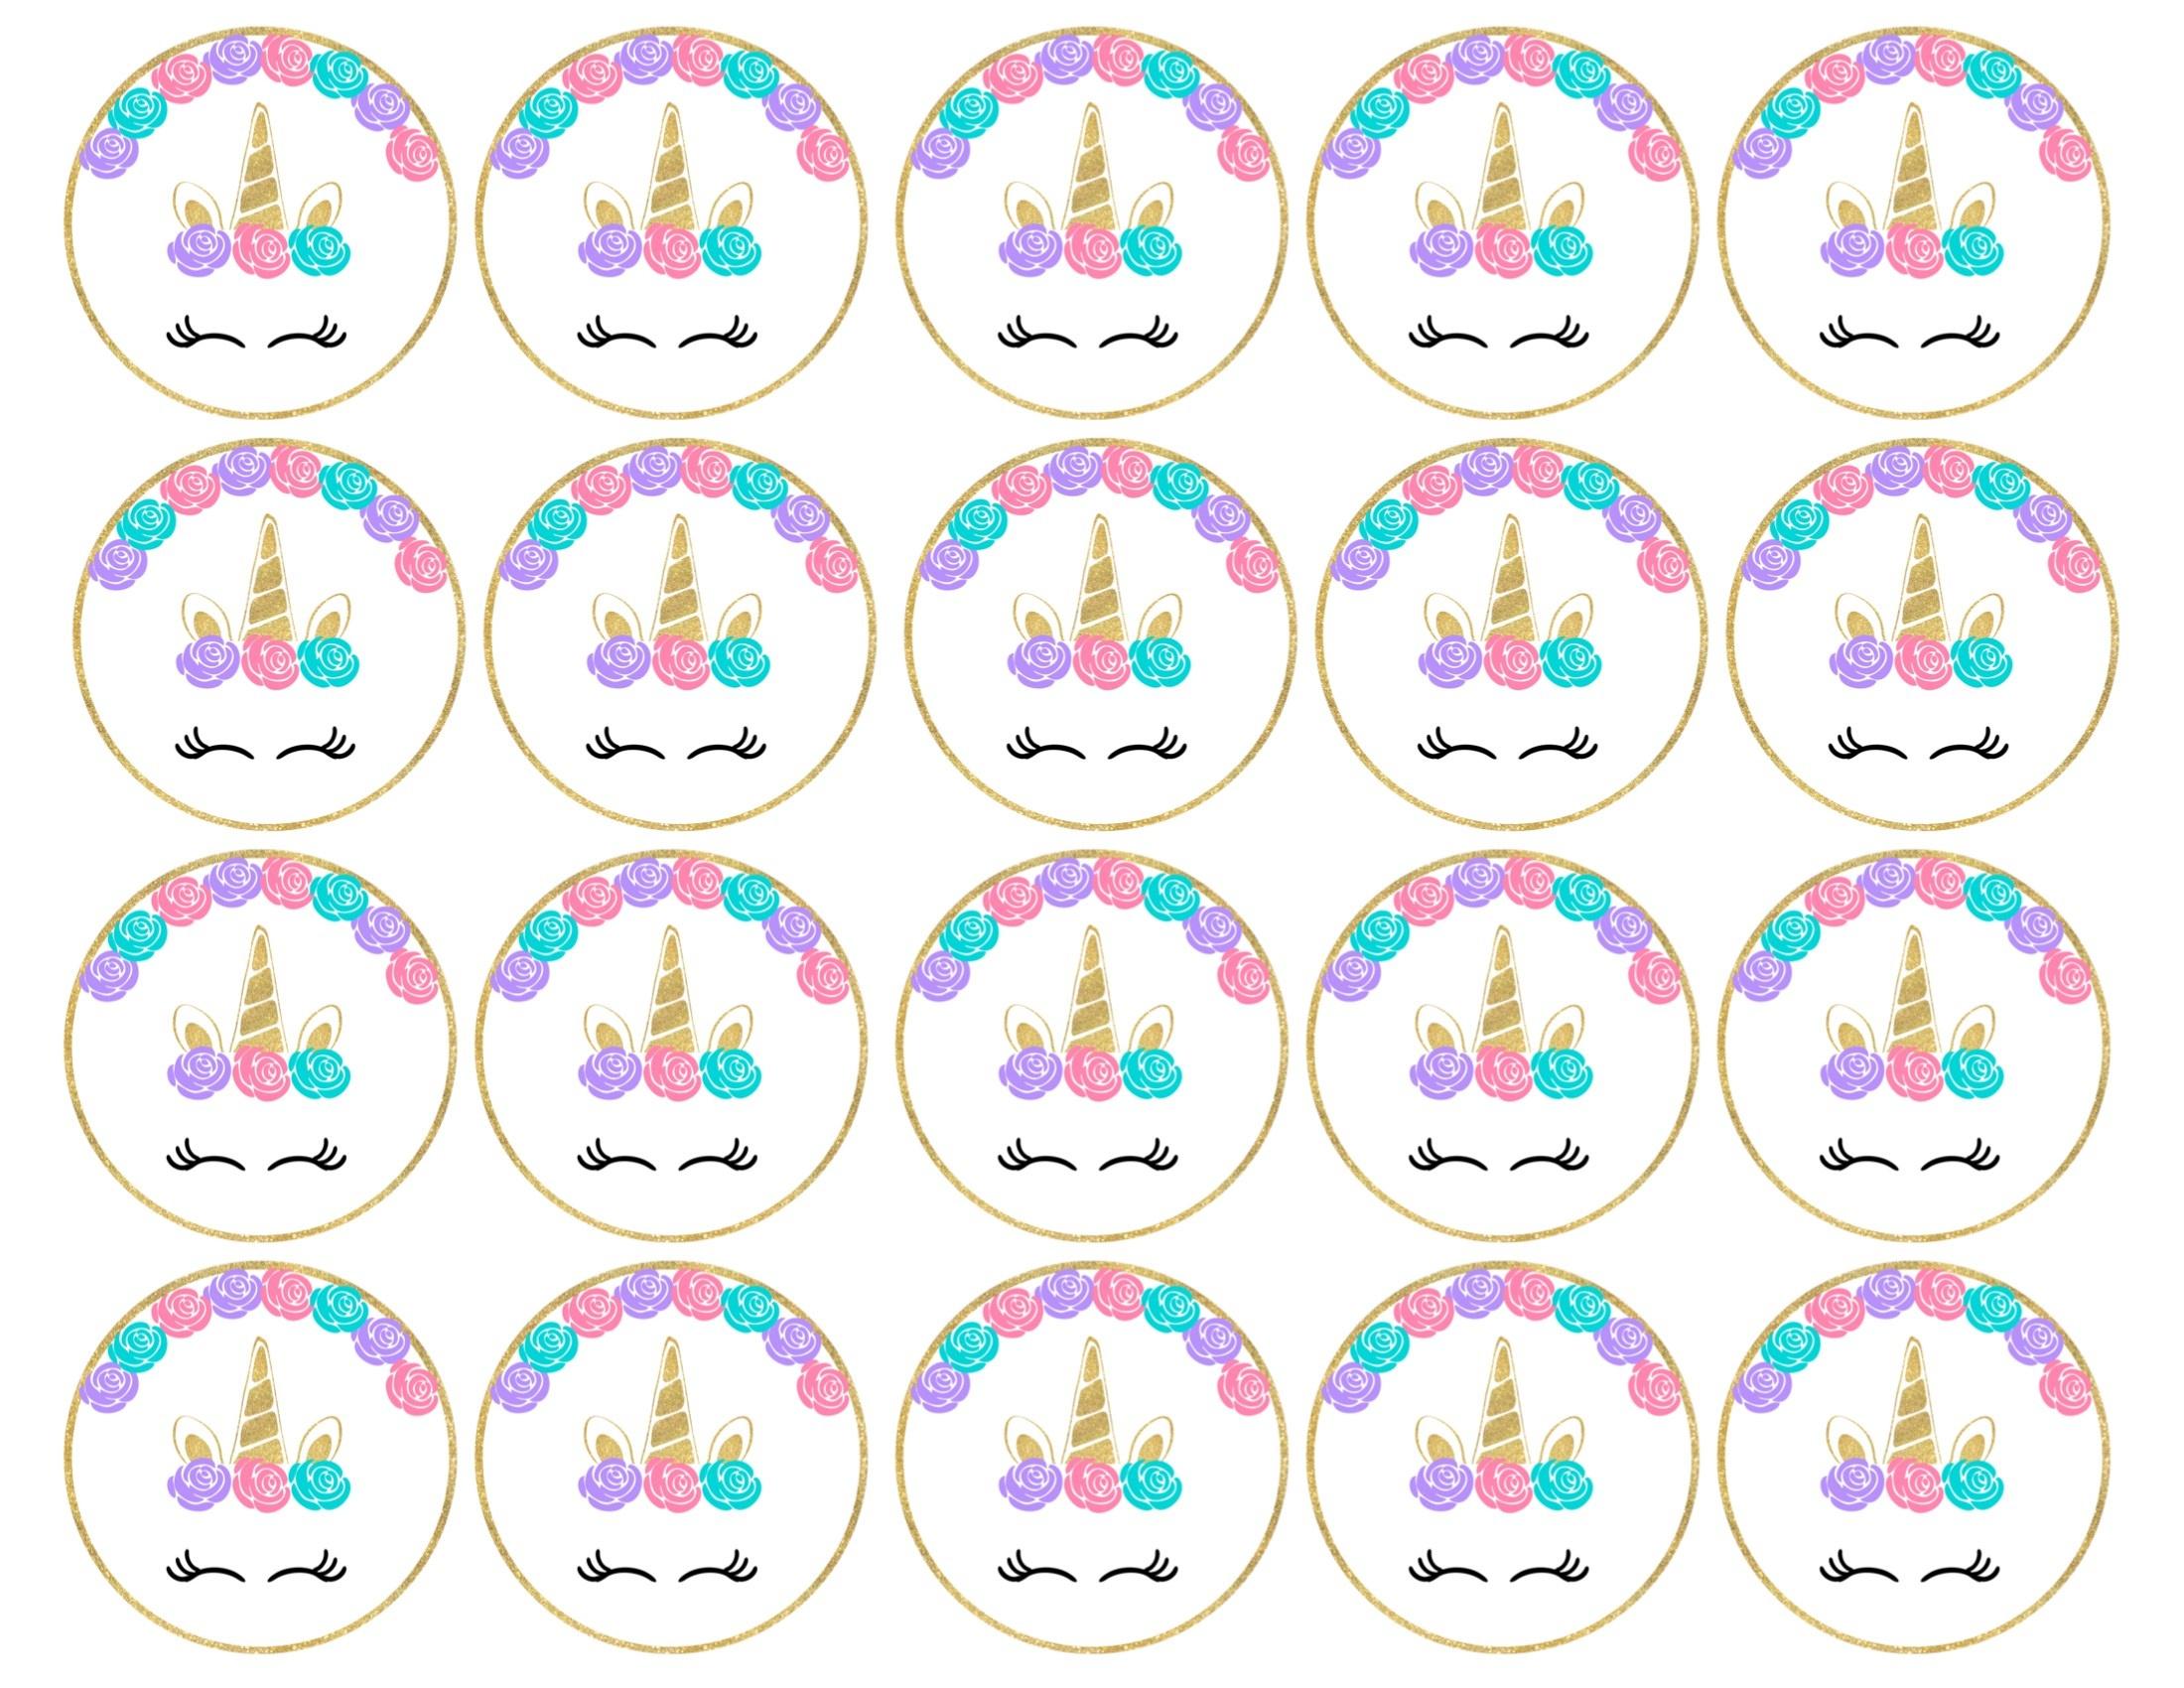 Free Printable Unicorn Cupcake Toppers - Paper Trail Design - Free Unicorn Party Printables